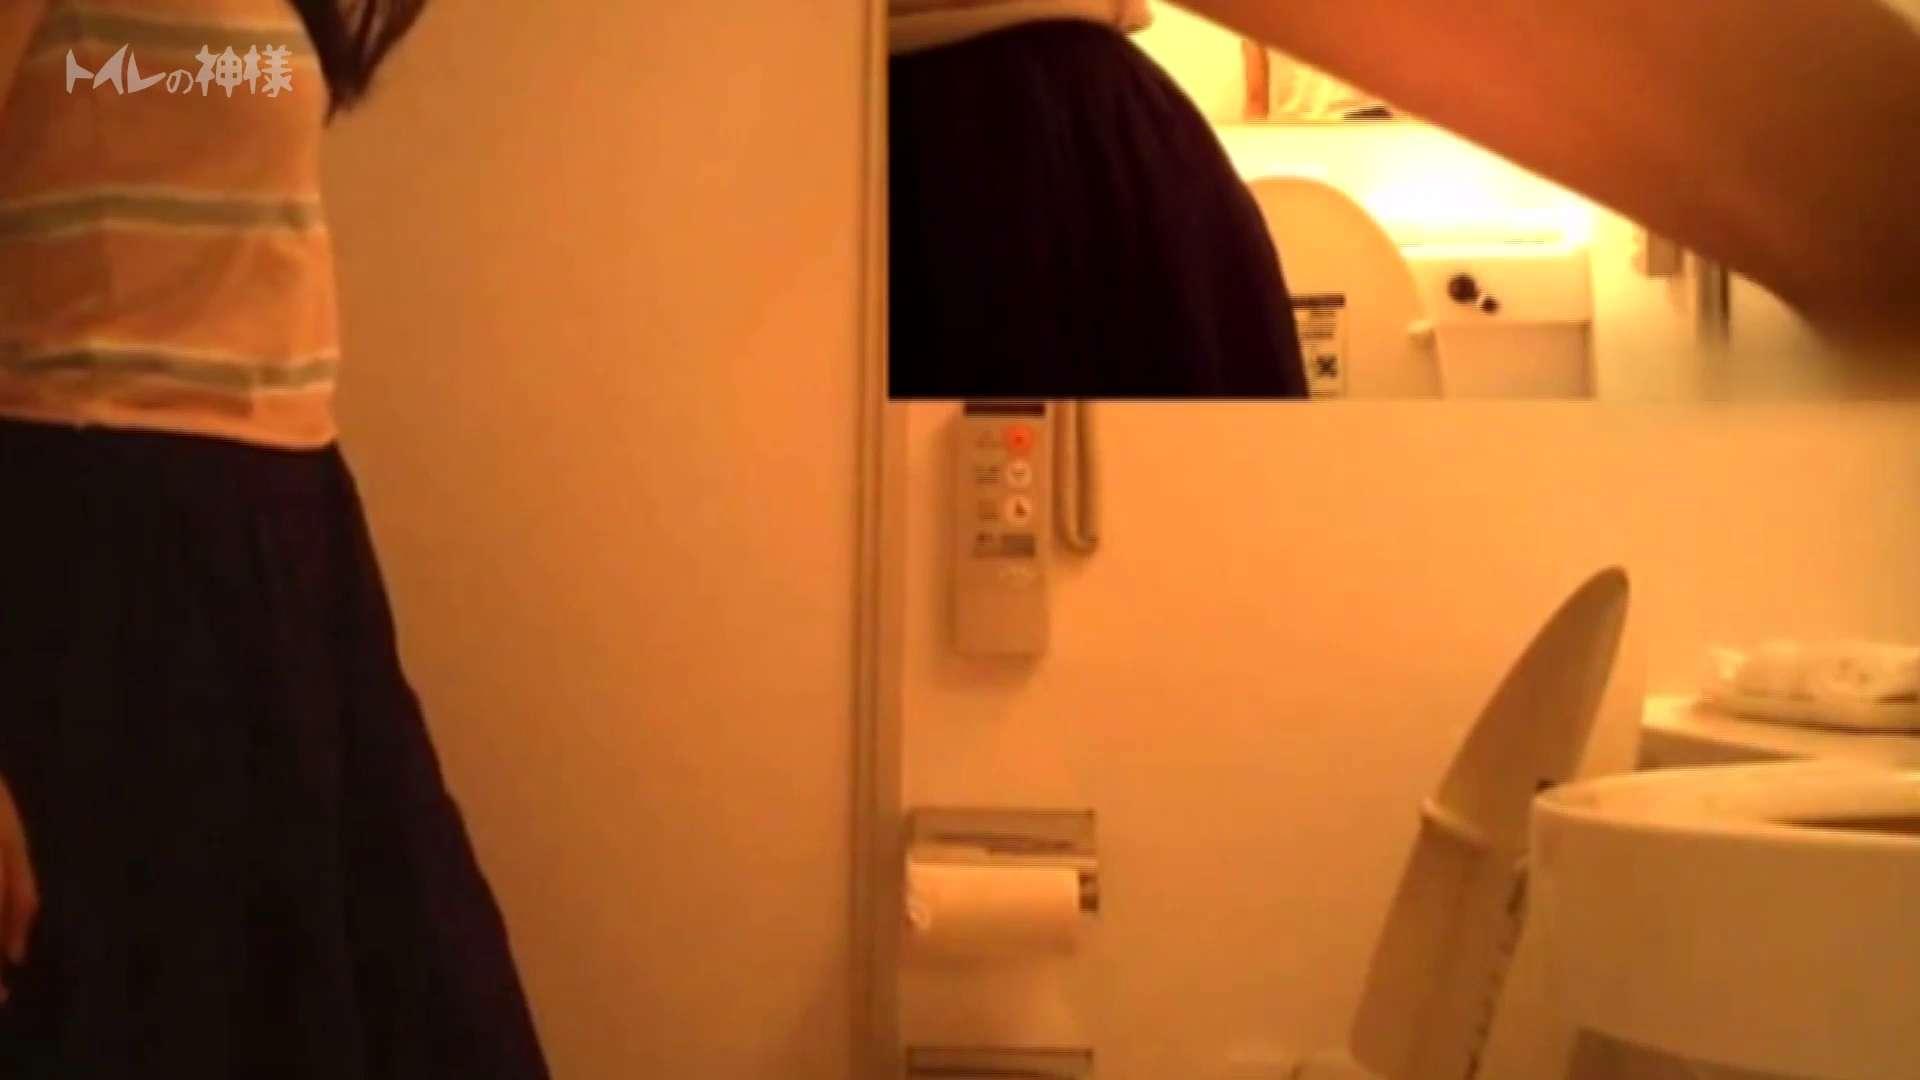 Vol.04 女子大生のトイレ恥態 トイレ盗撮 | 丸見え  92枚 85